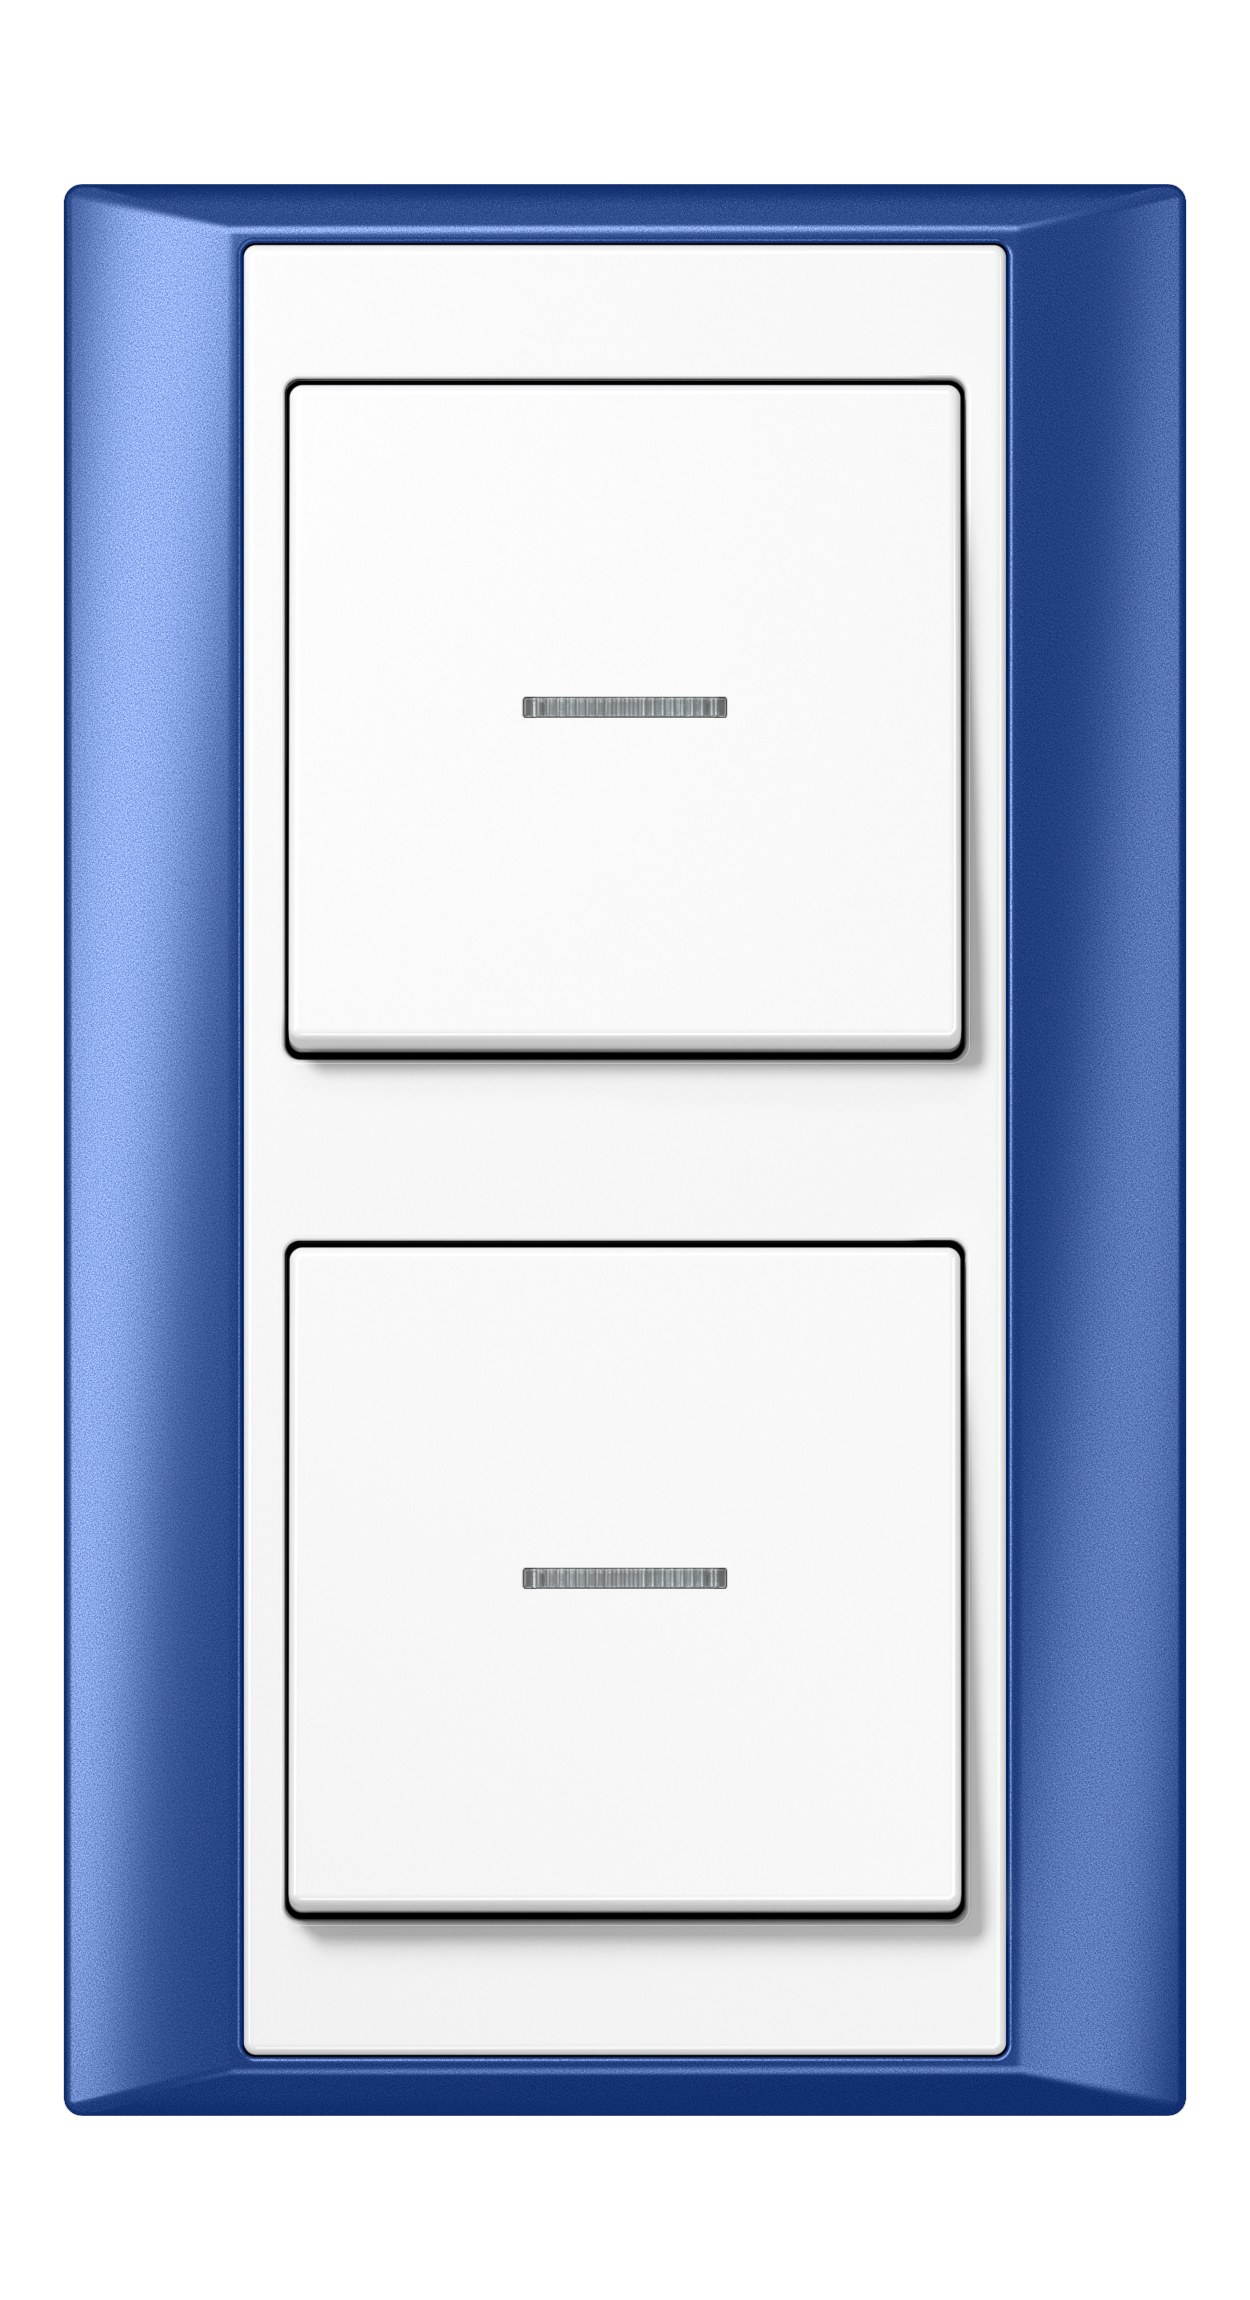 JUNG_Aplus_blue_white_switch-lense_switch-lense